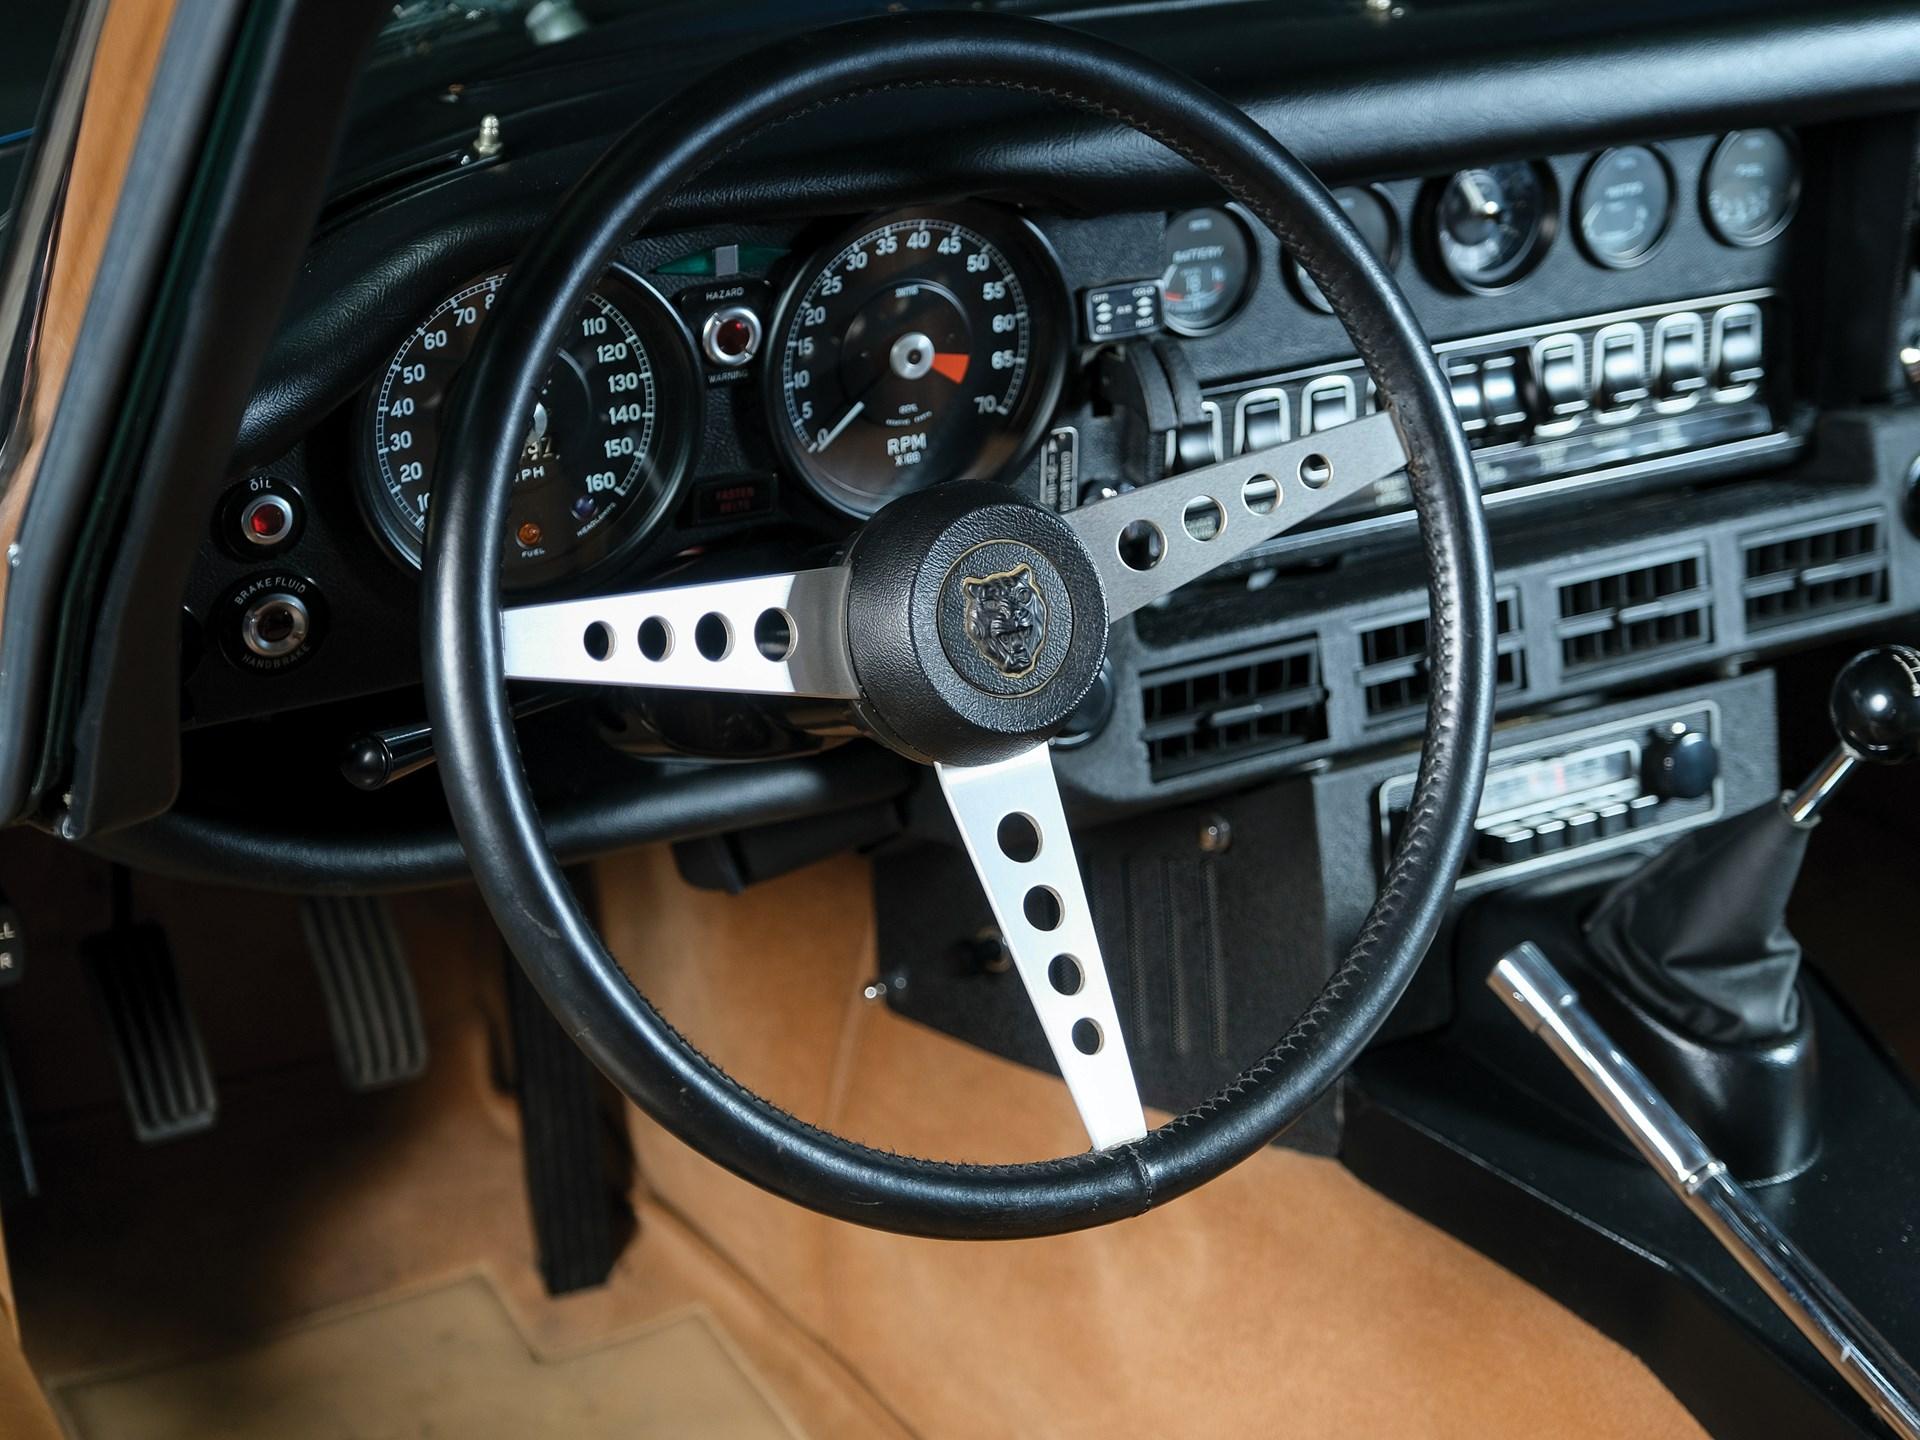 1973 Jaguar E-Type Series 3 V-12 Roadster